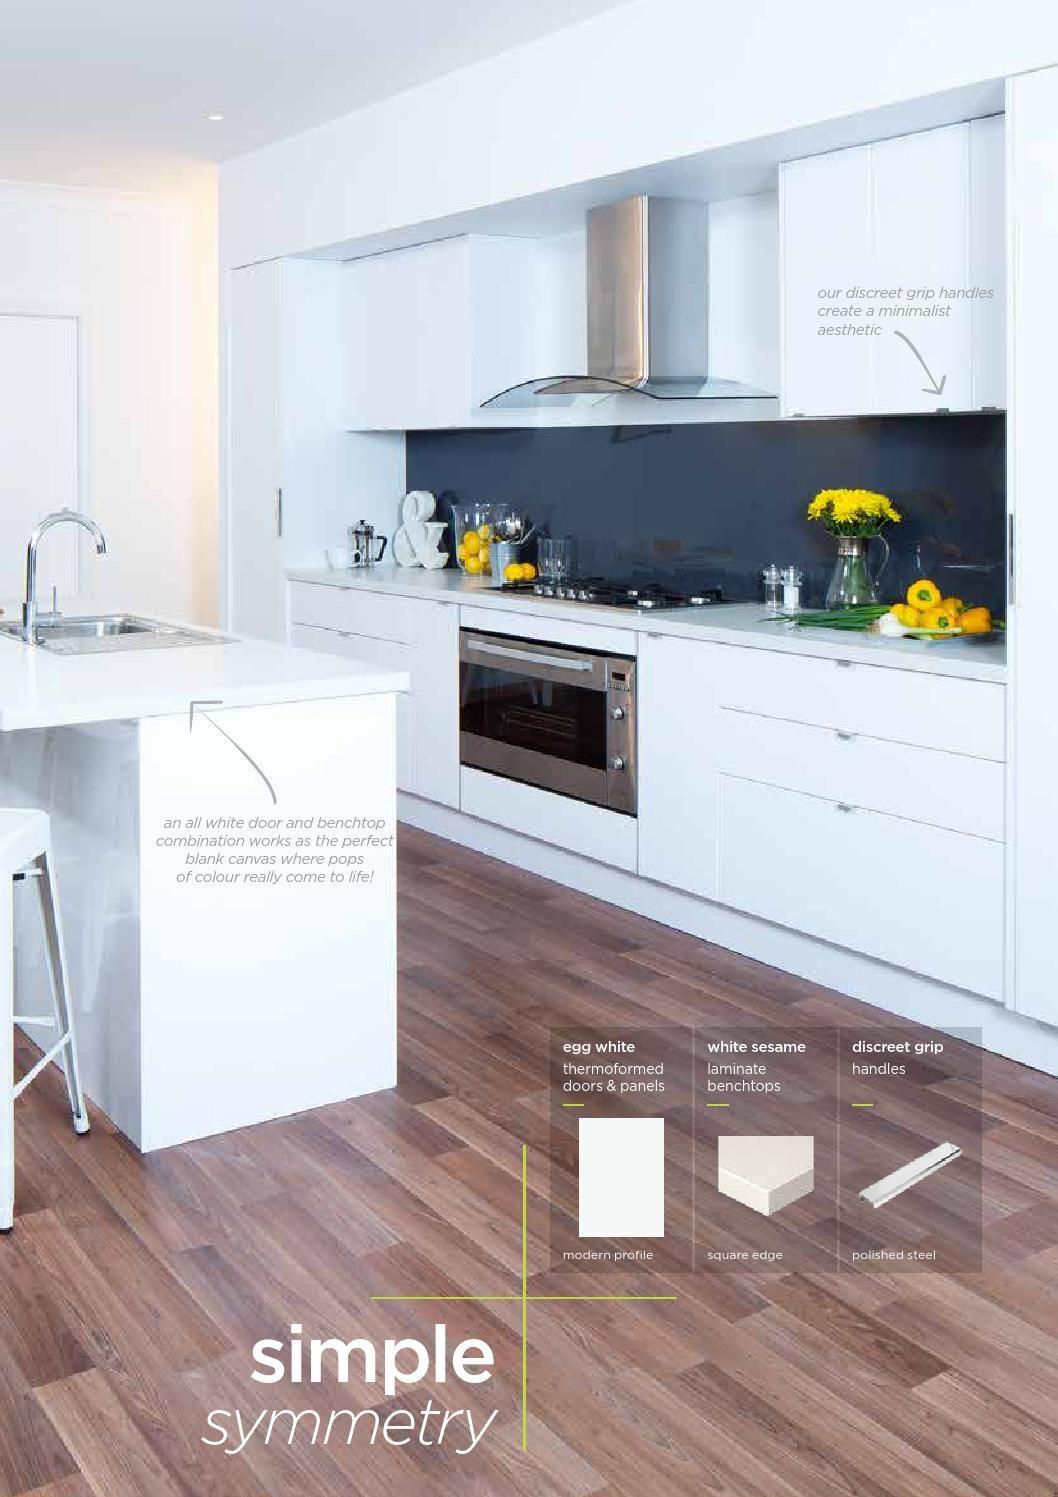 kaboodle kitchen australian catalogue kitchen design decor kitchen plans kitchen renovation on kaboodle kitchen design id=41516